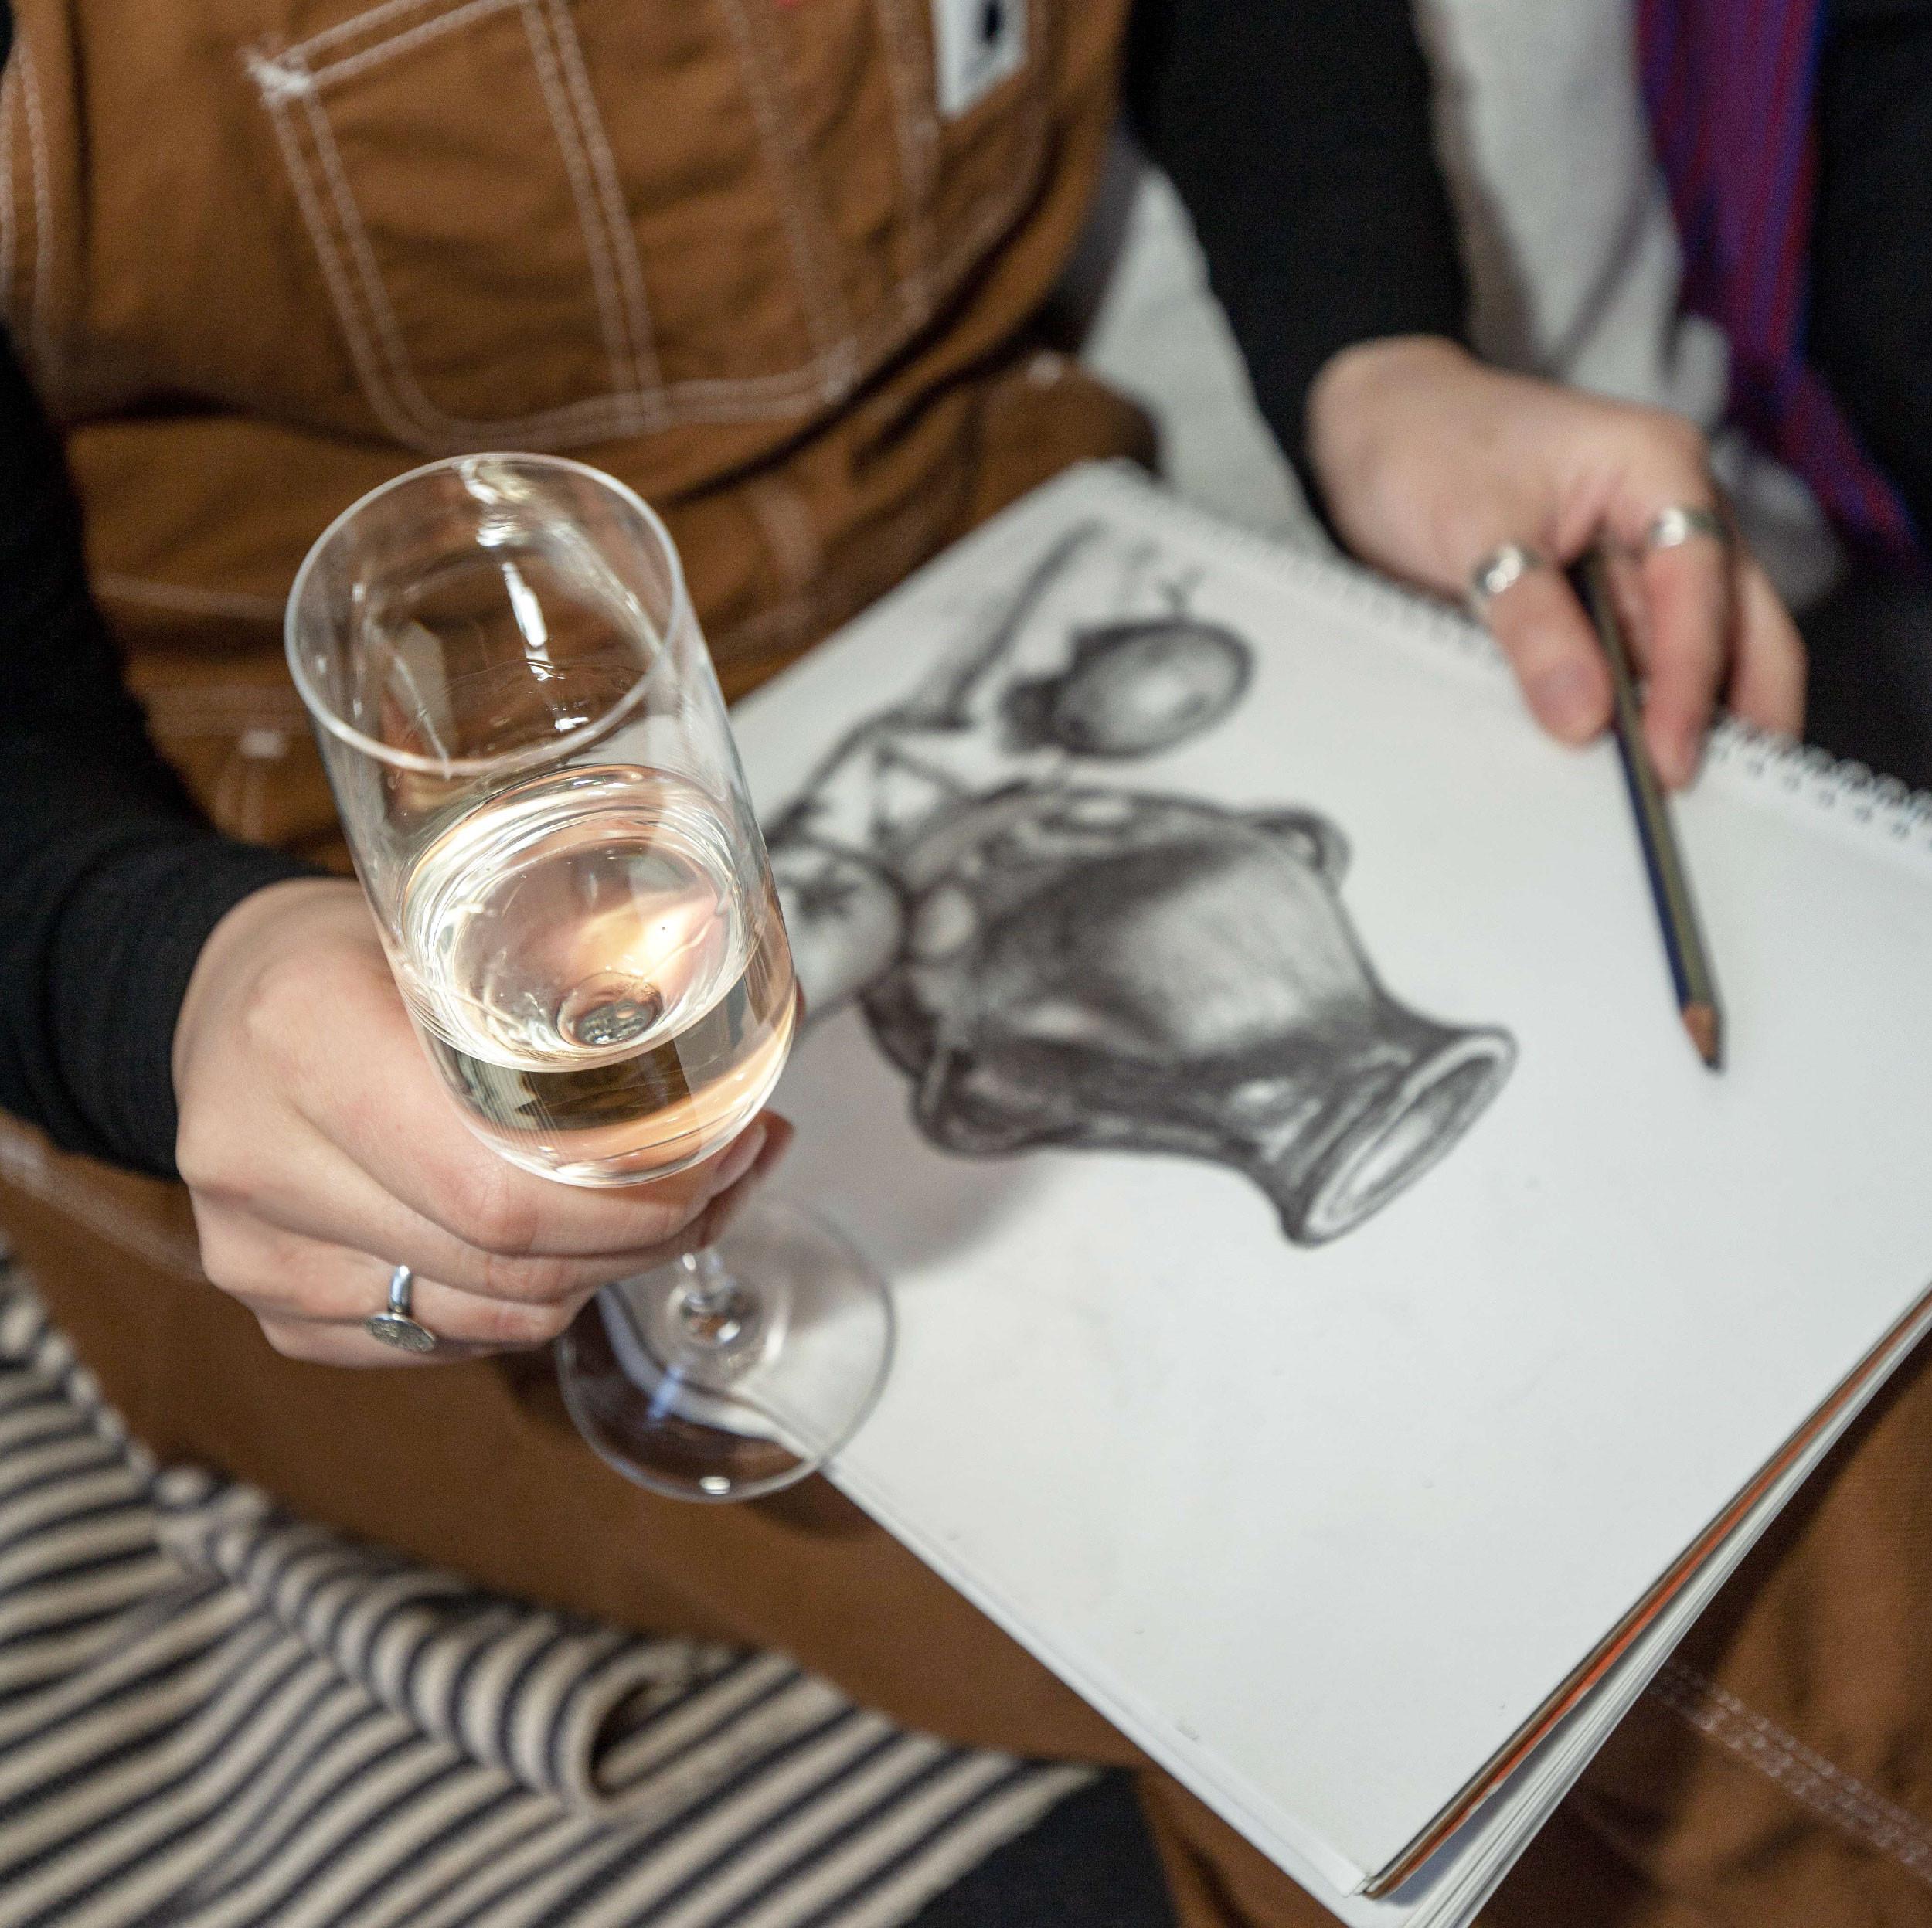 Drink and Draw | Still Life